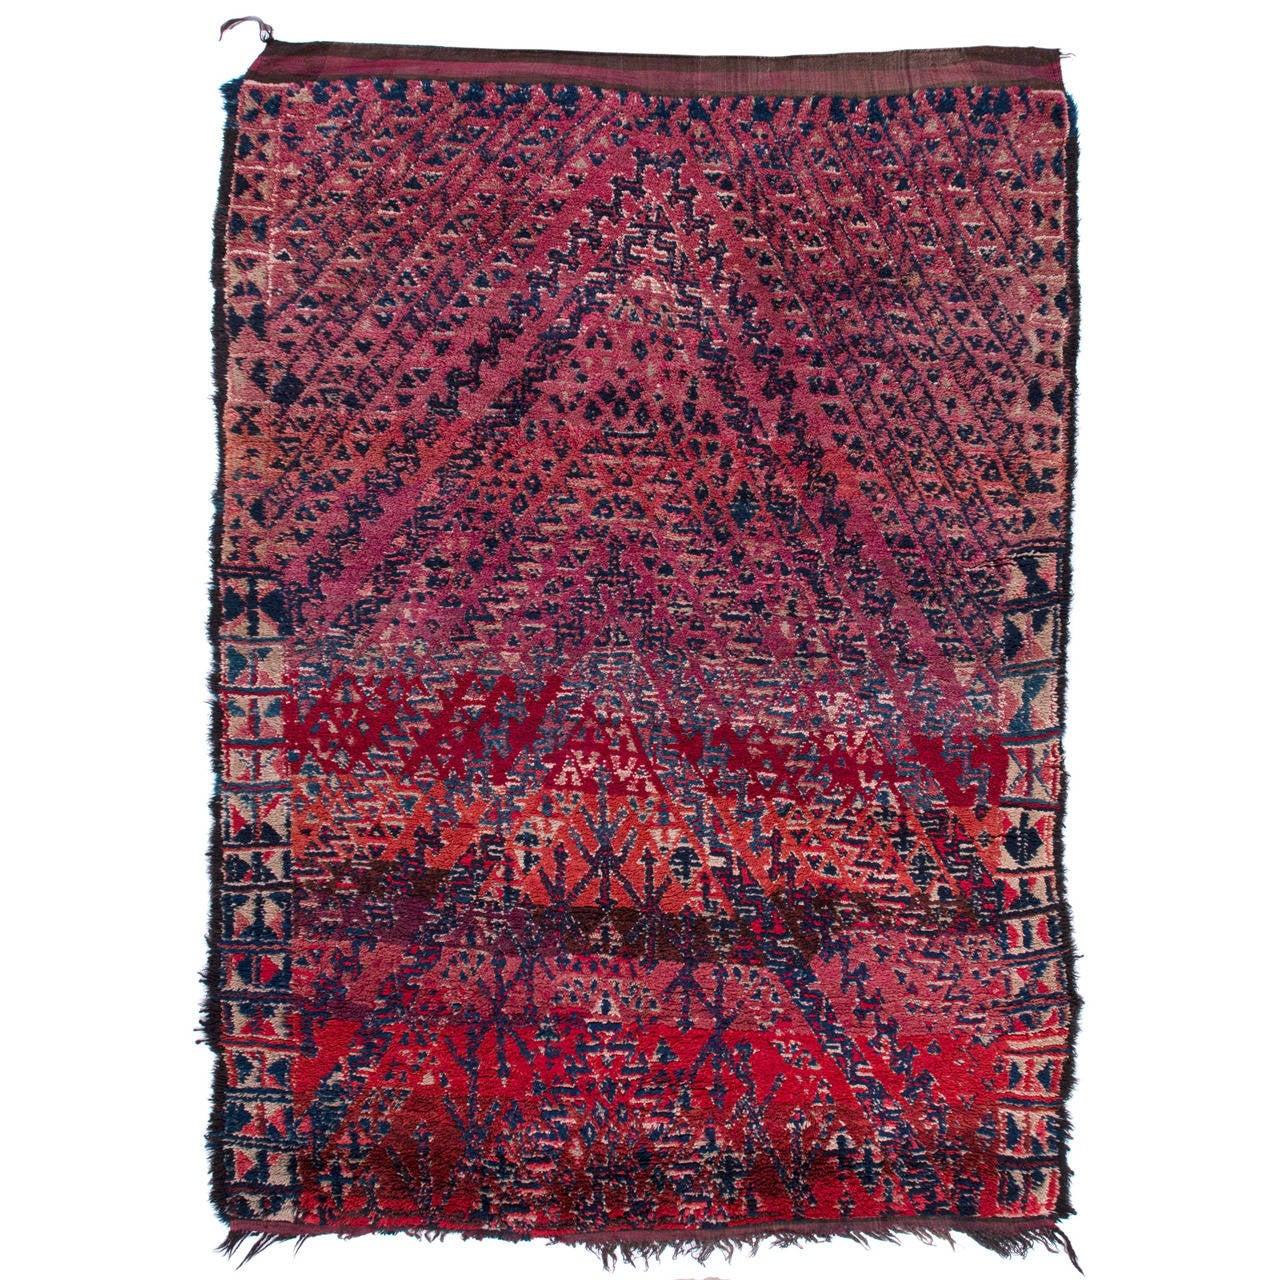 Vintage Moroccan Area Rug For Sale At 1stdibs: Vintage Moroccan Berber Rug At 1stdibs